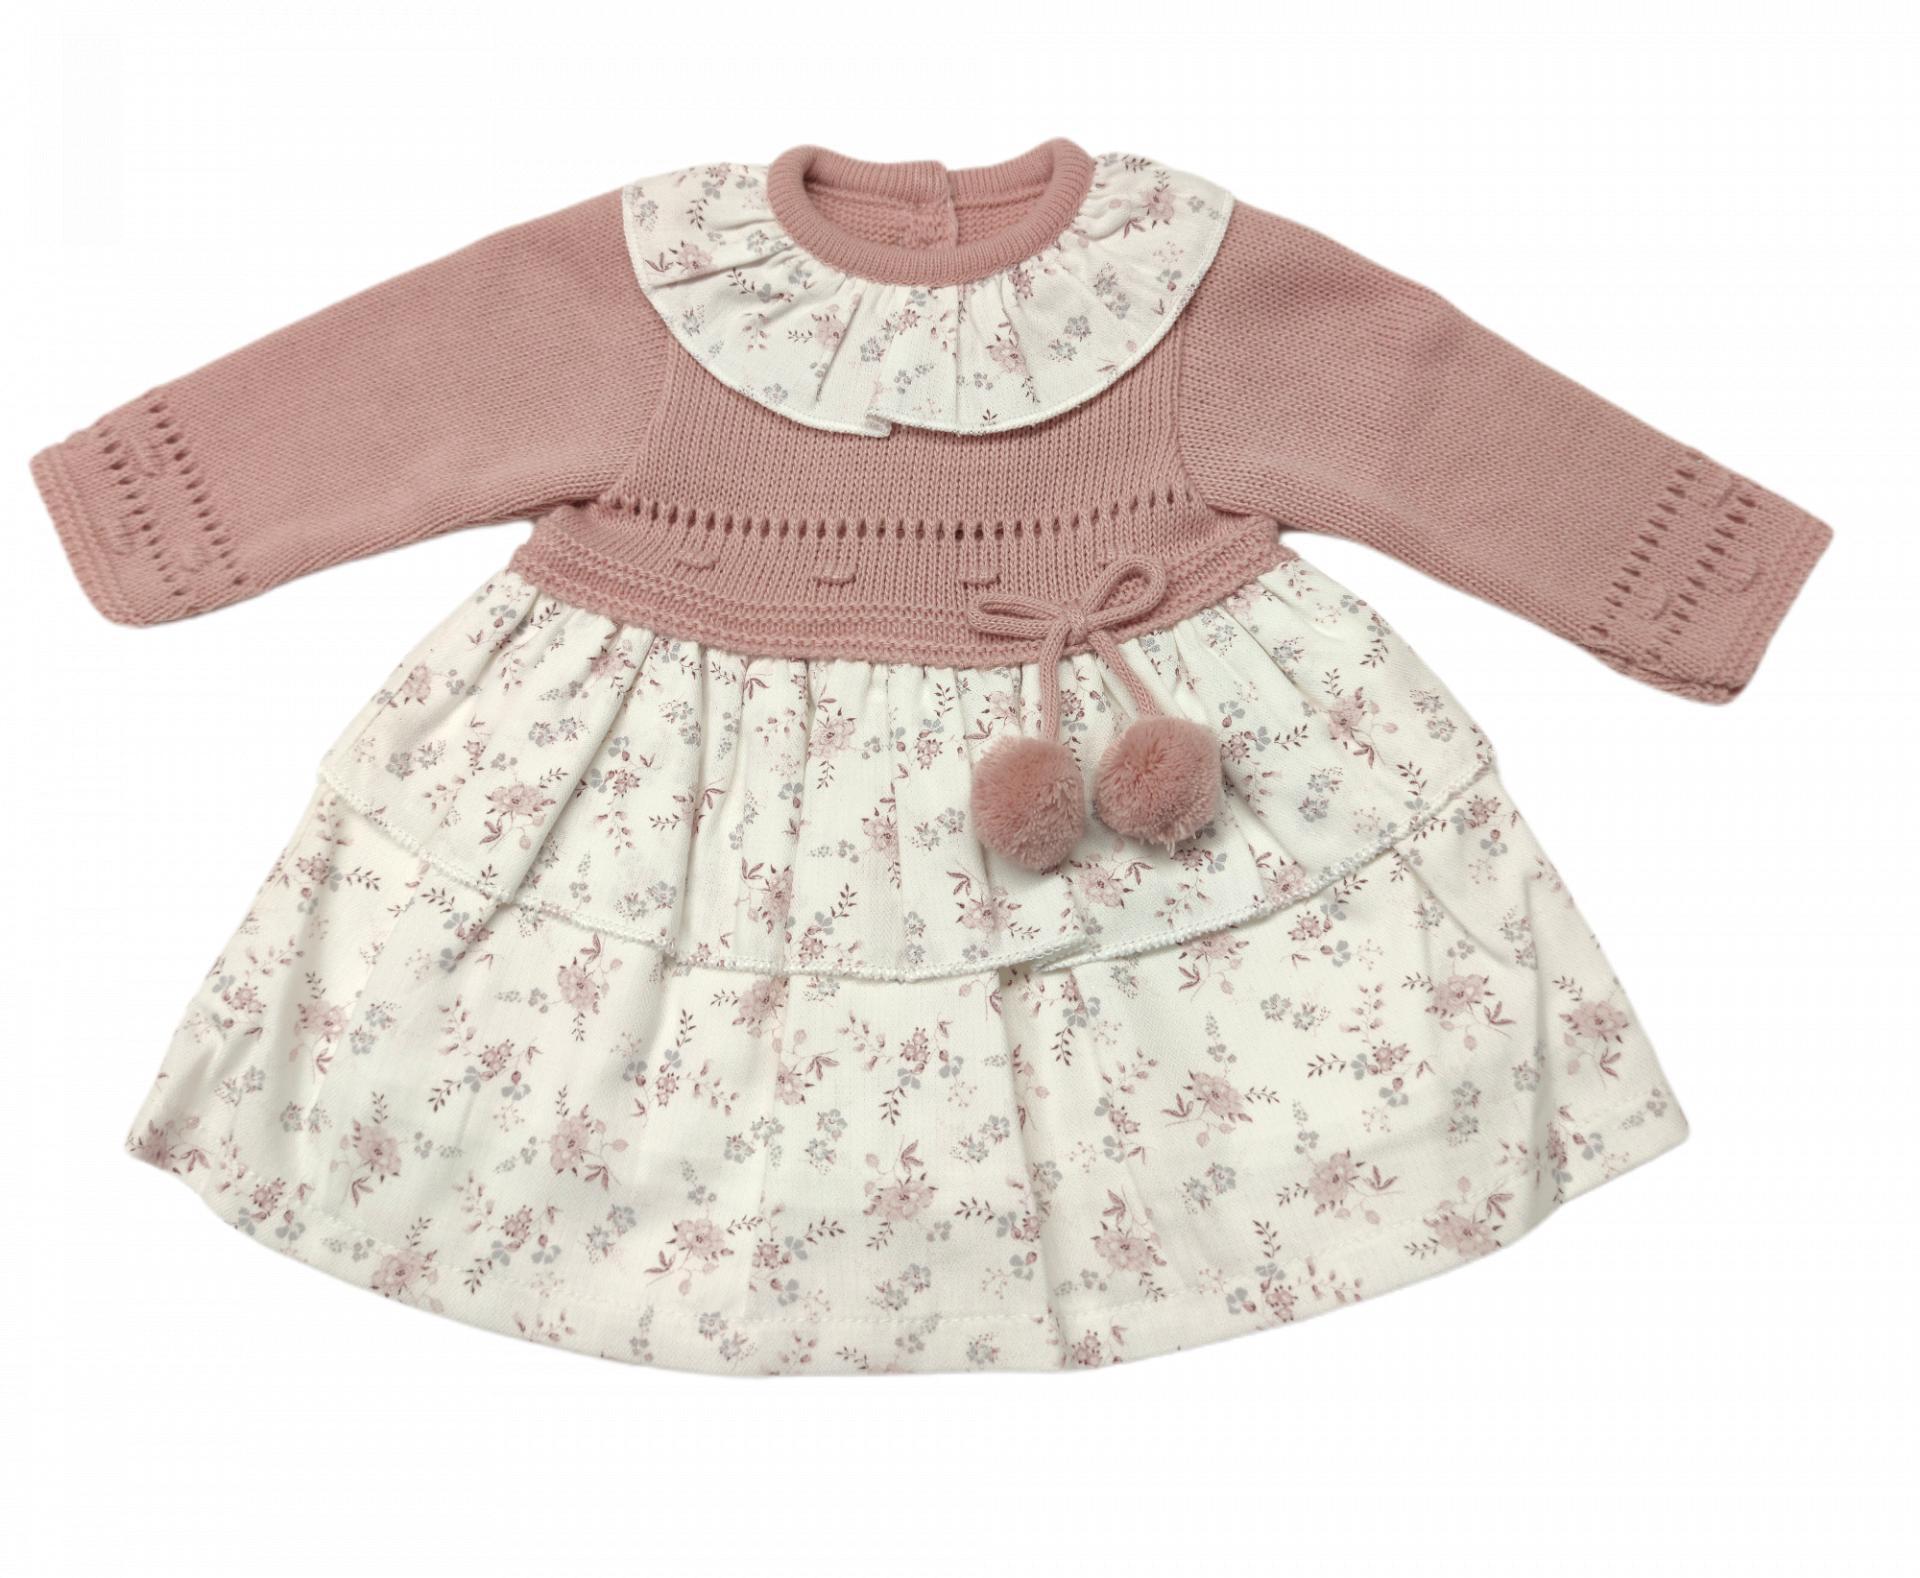 Vestido de niña en dos telas Flores